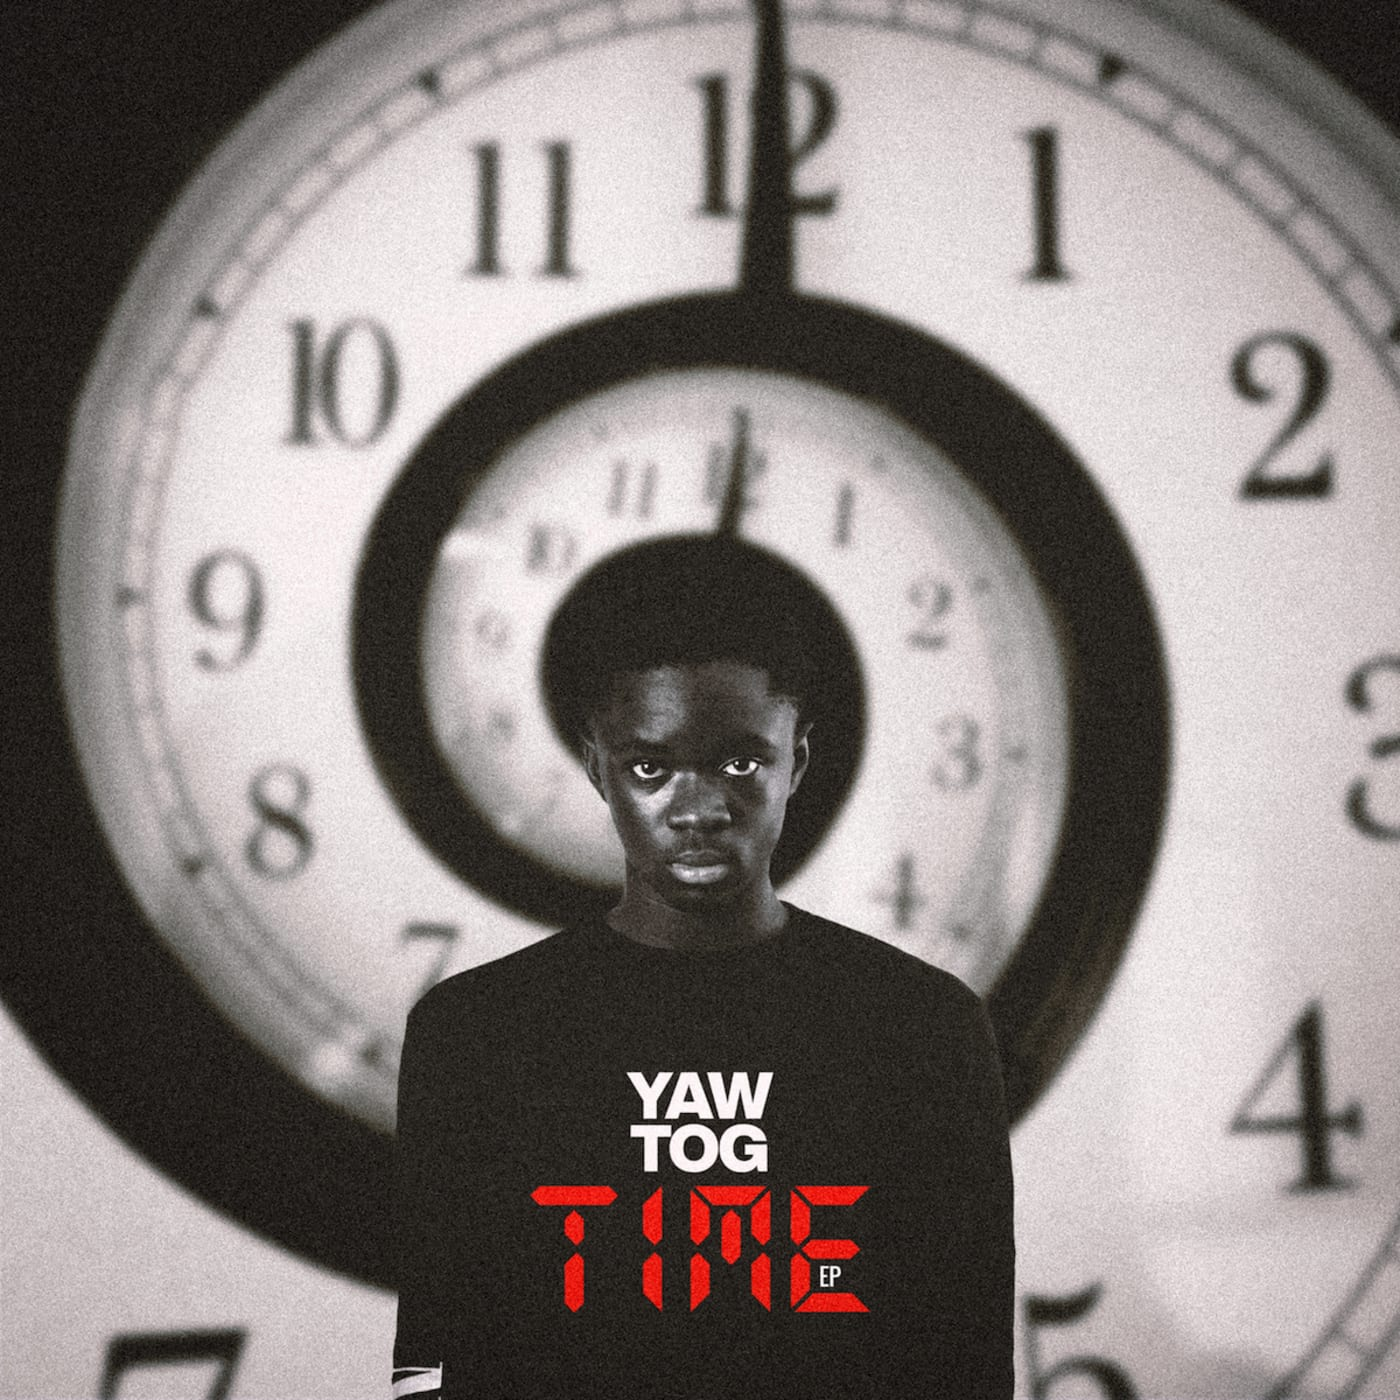 Yaw Tog - 'Time' EP